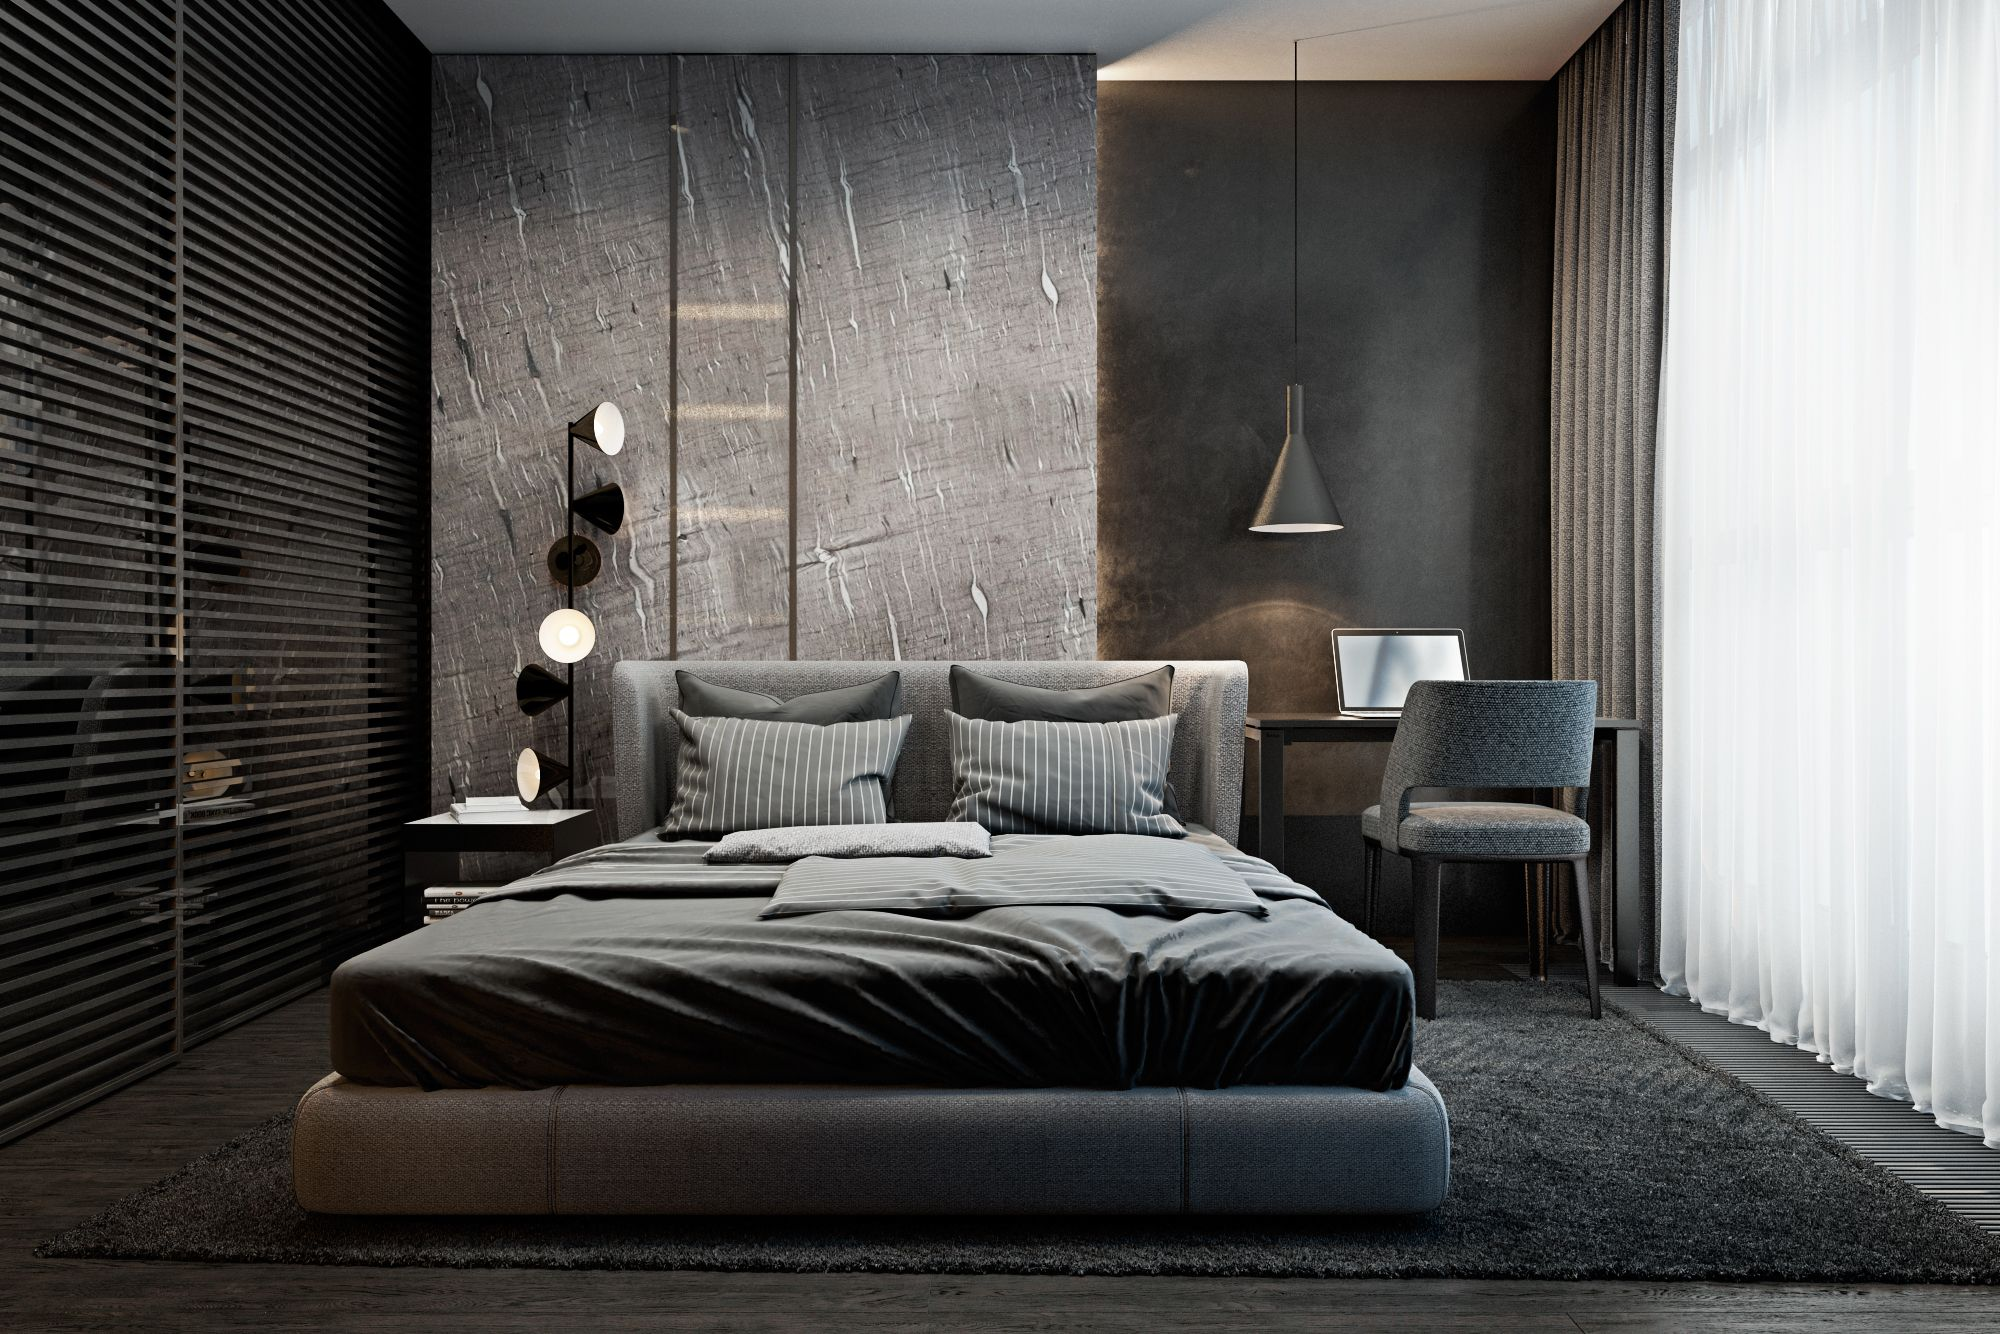 New bedroom interior design  minimalist living room ideas of your space  behance bedrooms